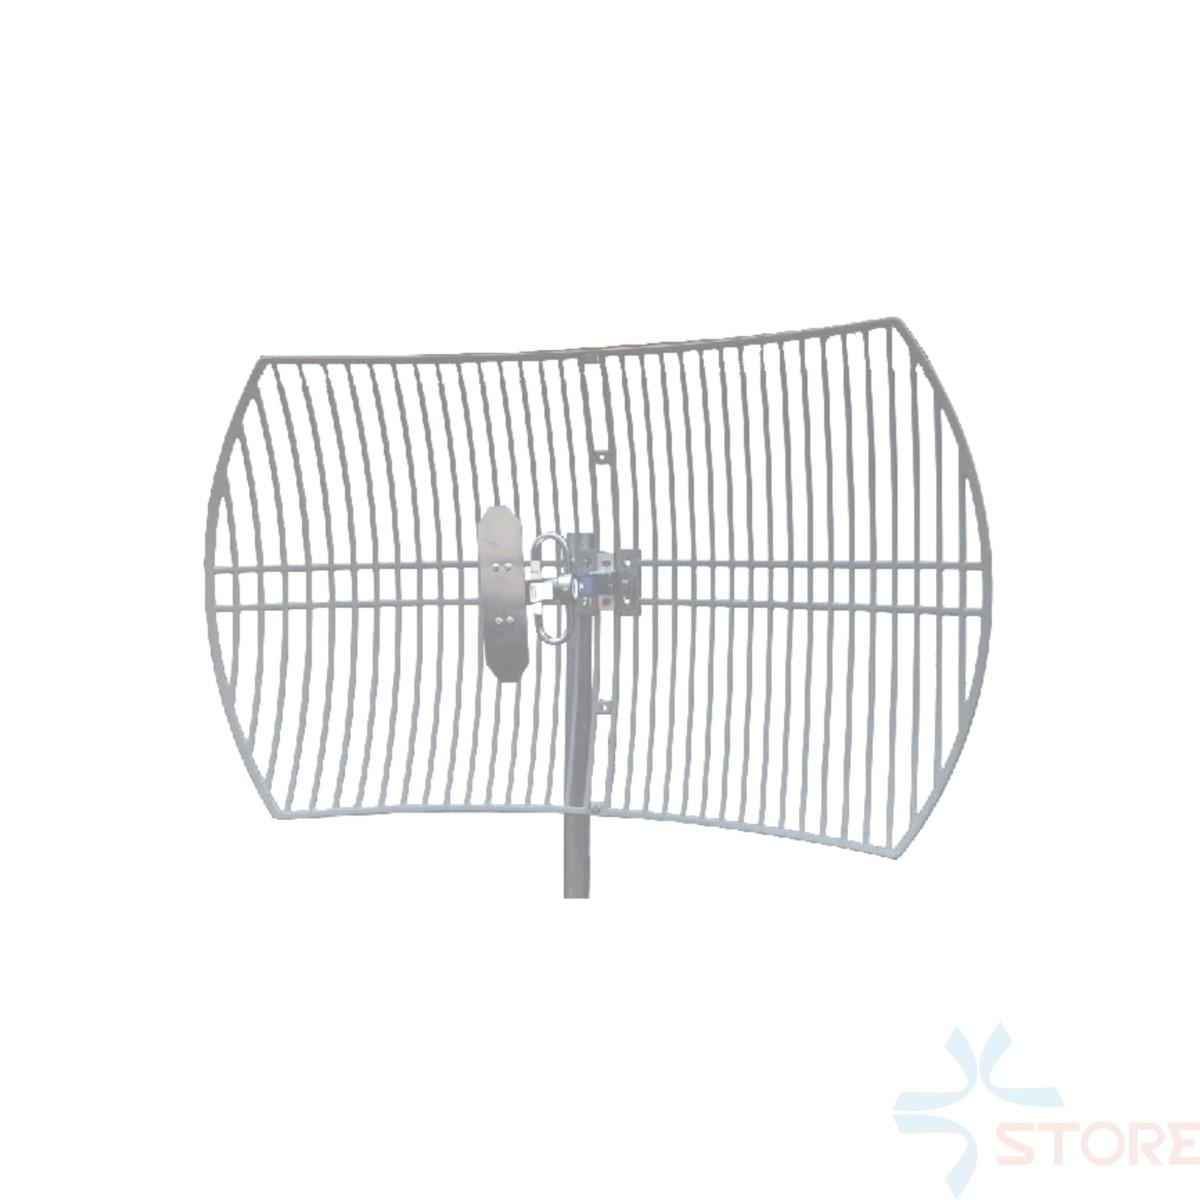 0 9ghz 900mhz 15dbi High Gain Gsm Directional Parabolic Grid Antenna For Uhf Cuav Data